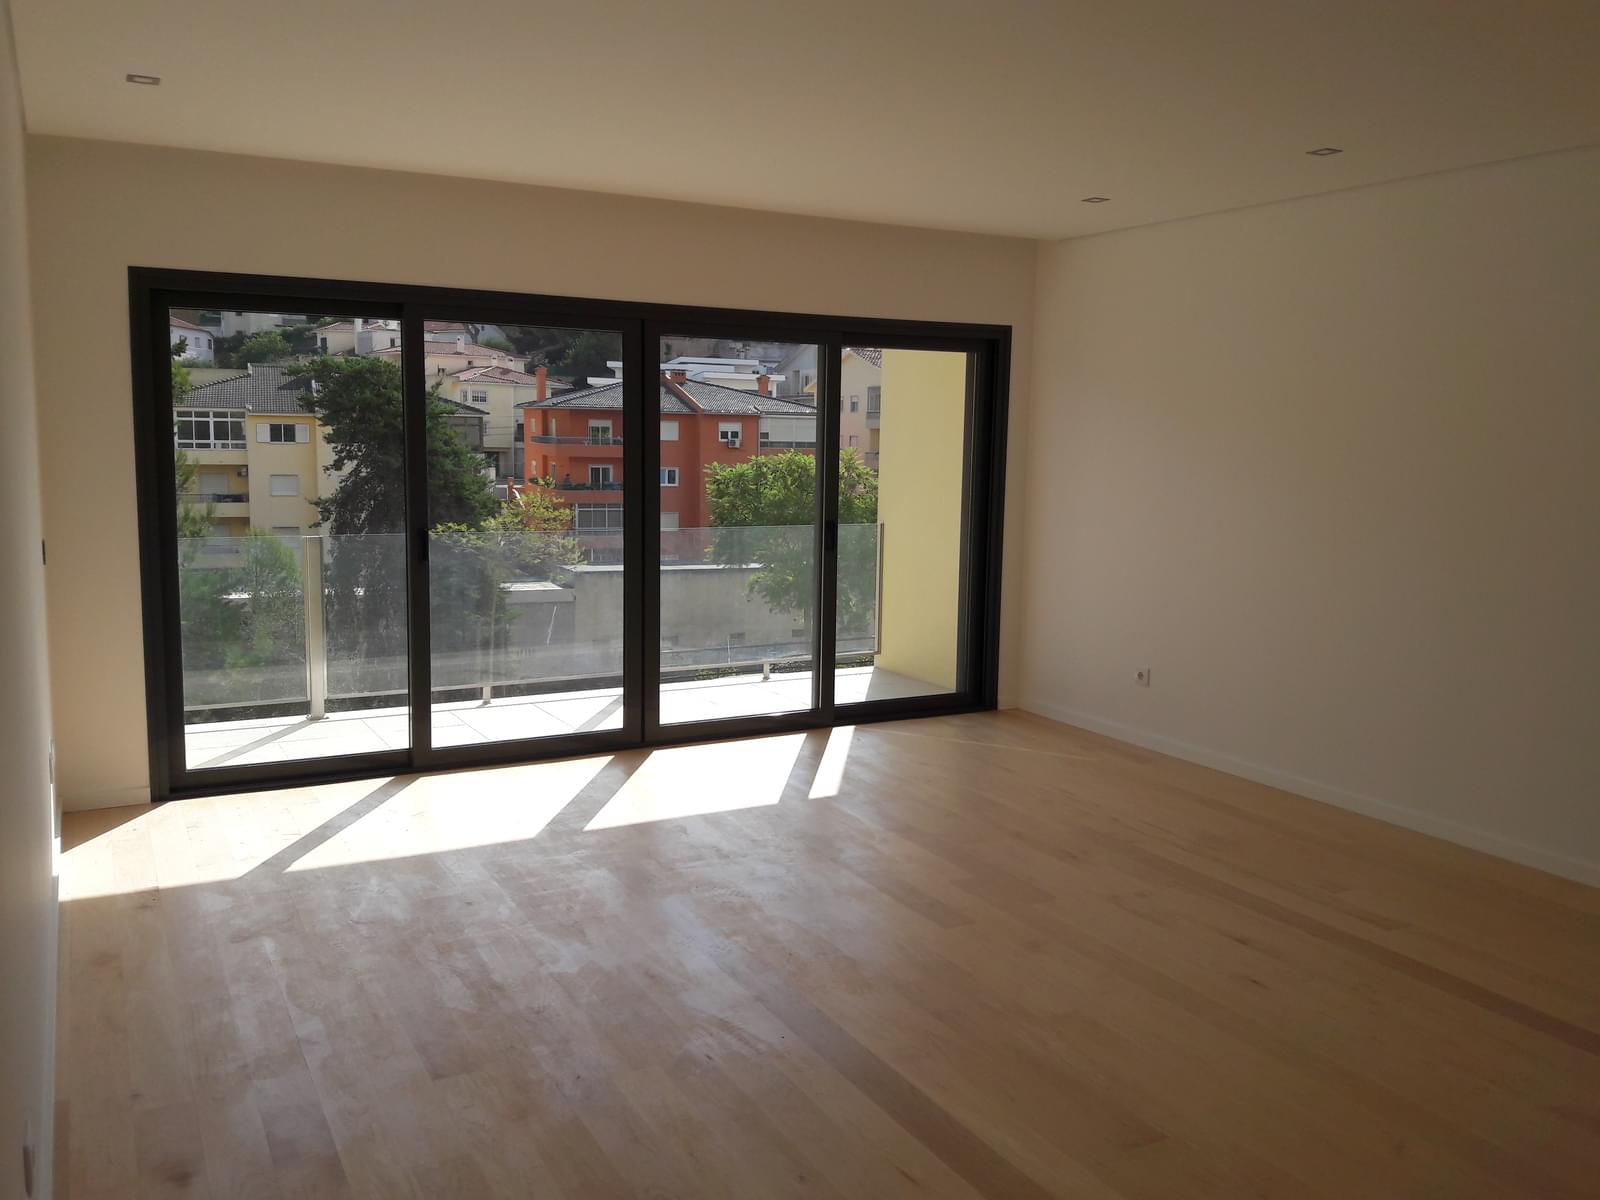 pf18284-apartamento-t2-cascais-4f6fa06c-3bb1-46ed-b72c-d3960bd1fa50